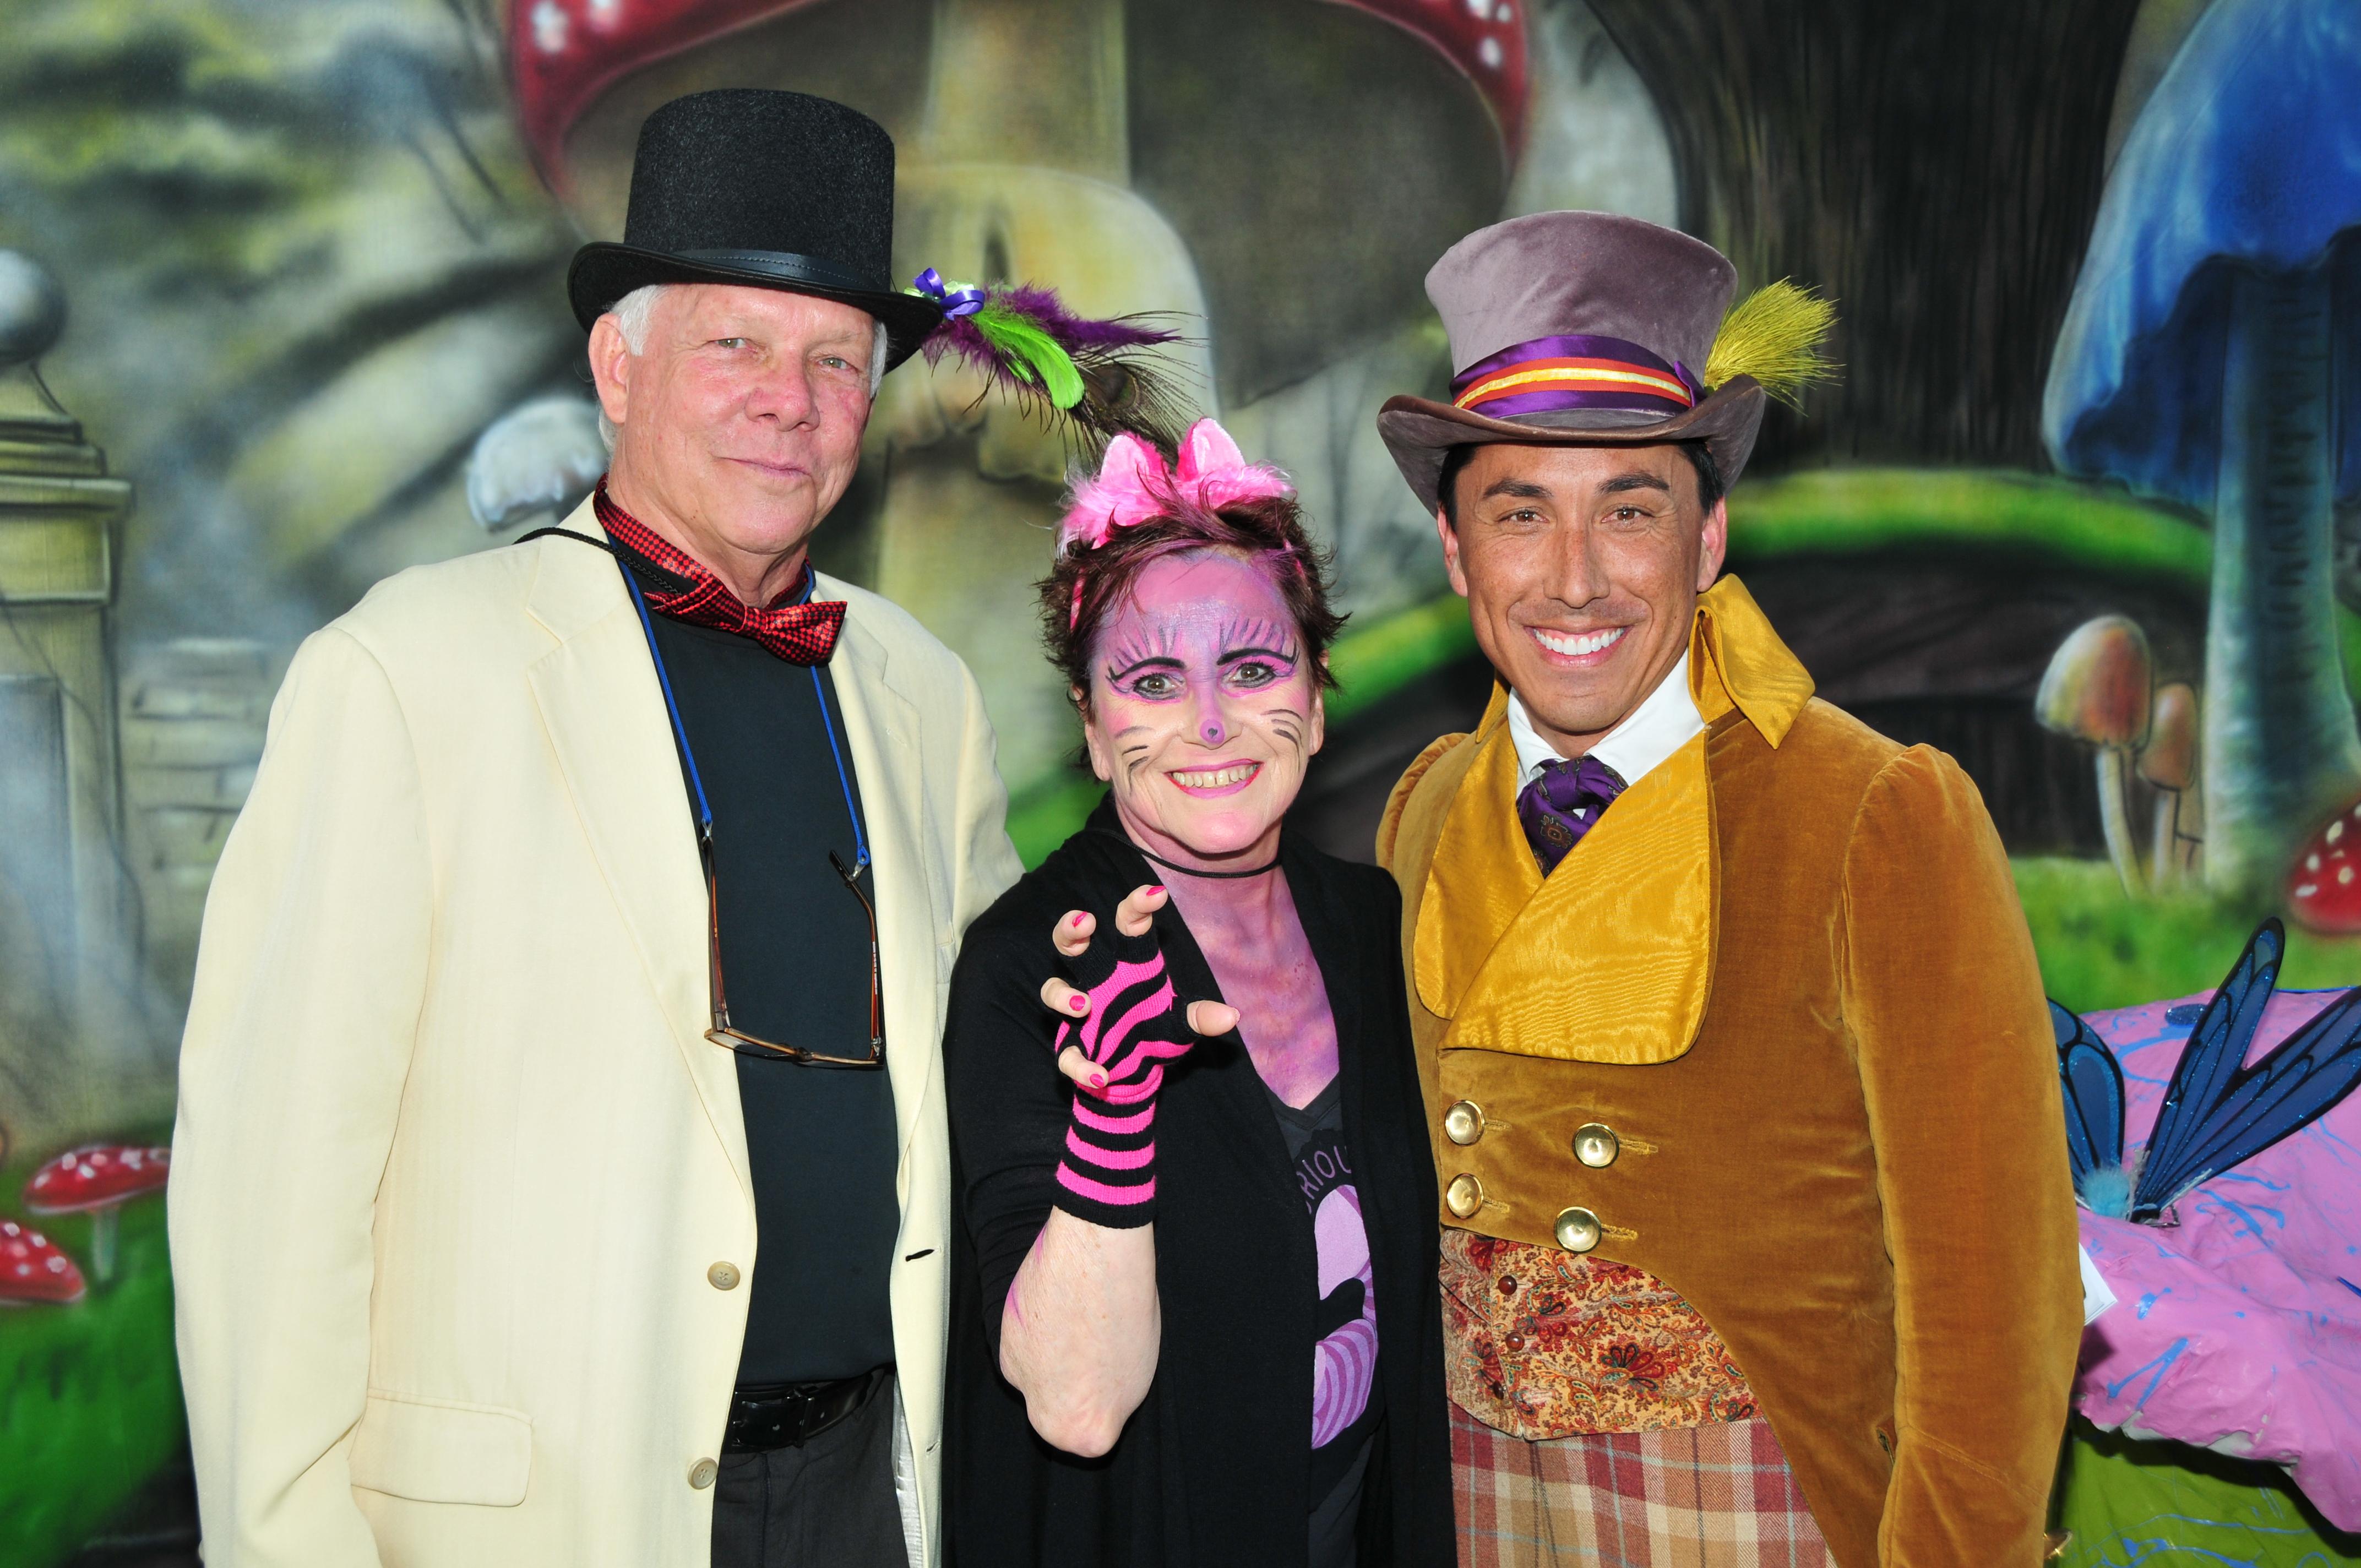 Jim Tiffany, Patti Roscoe and Todd Gloria